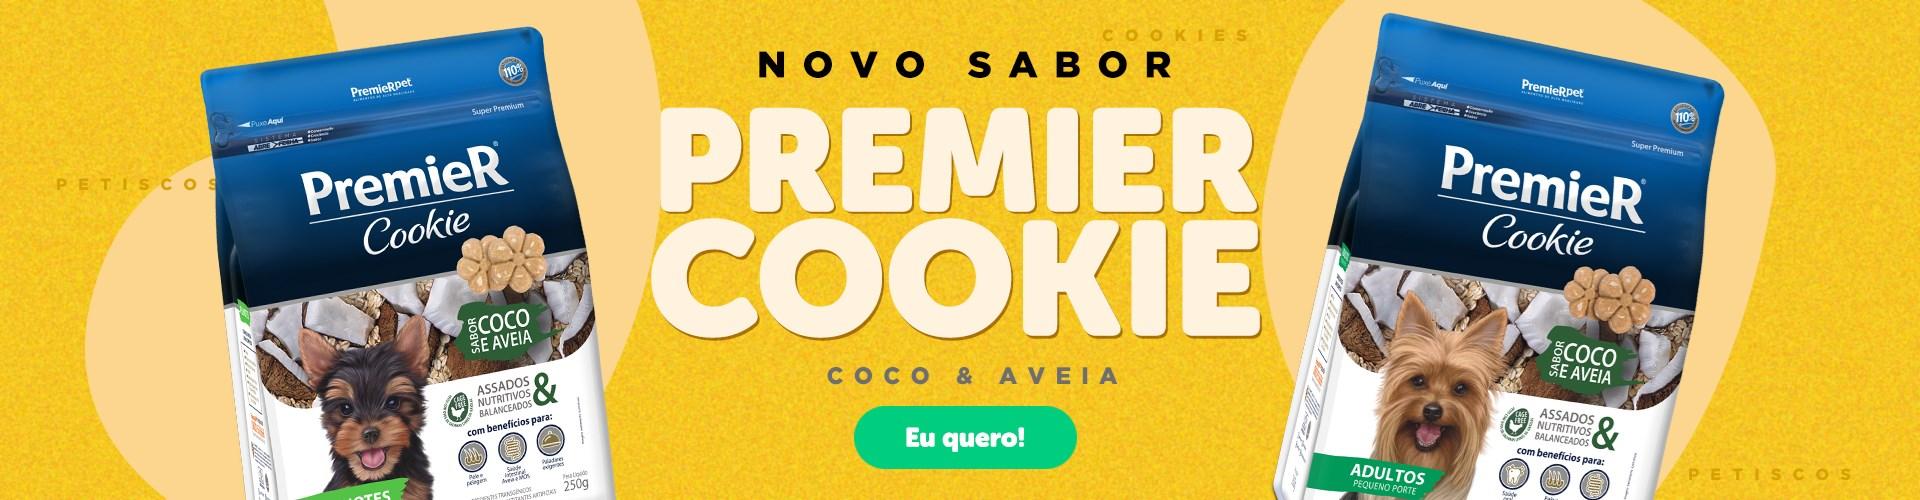 PremieR cookie